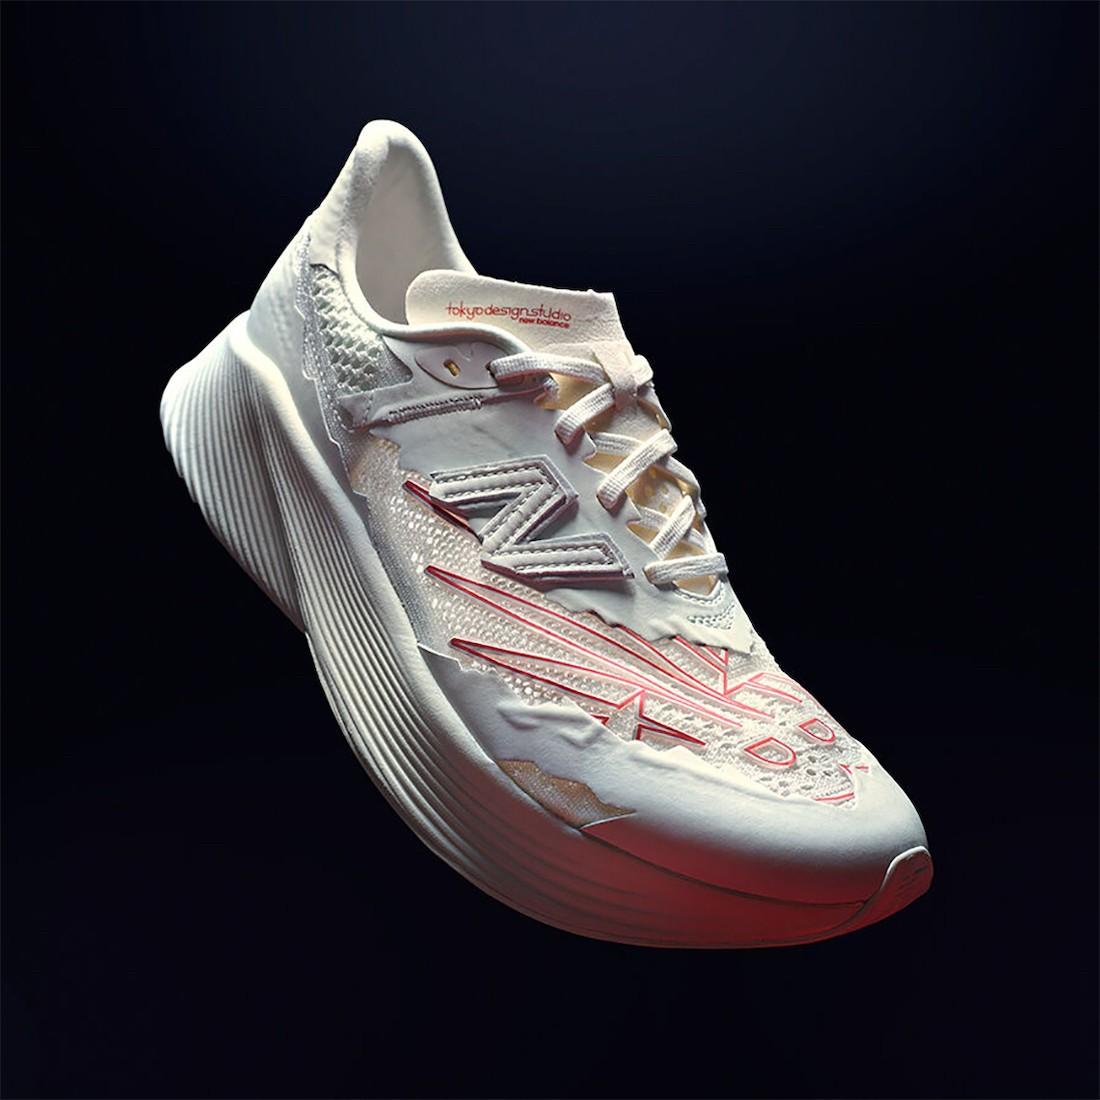 Tokyo Design Studio,New Balanc  发售日期确定!石头岛 x NB 完整曝光,鞋型居然是...